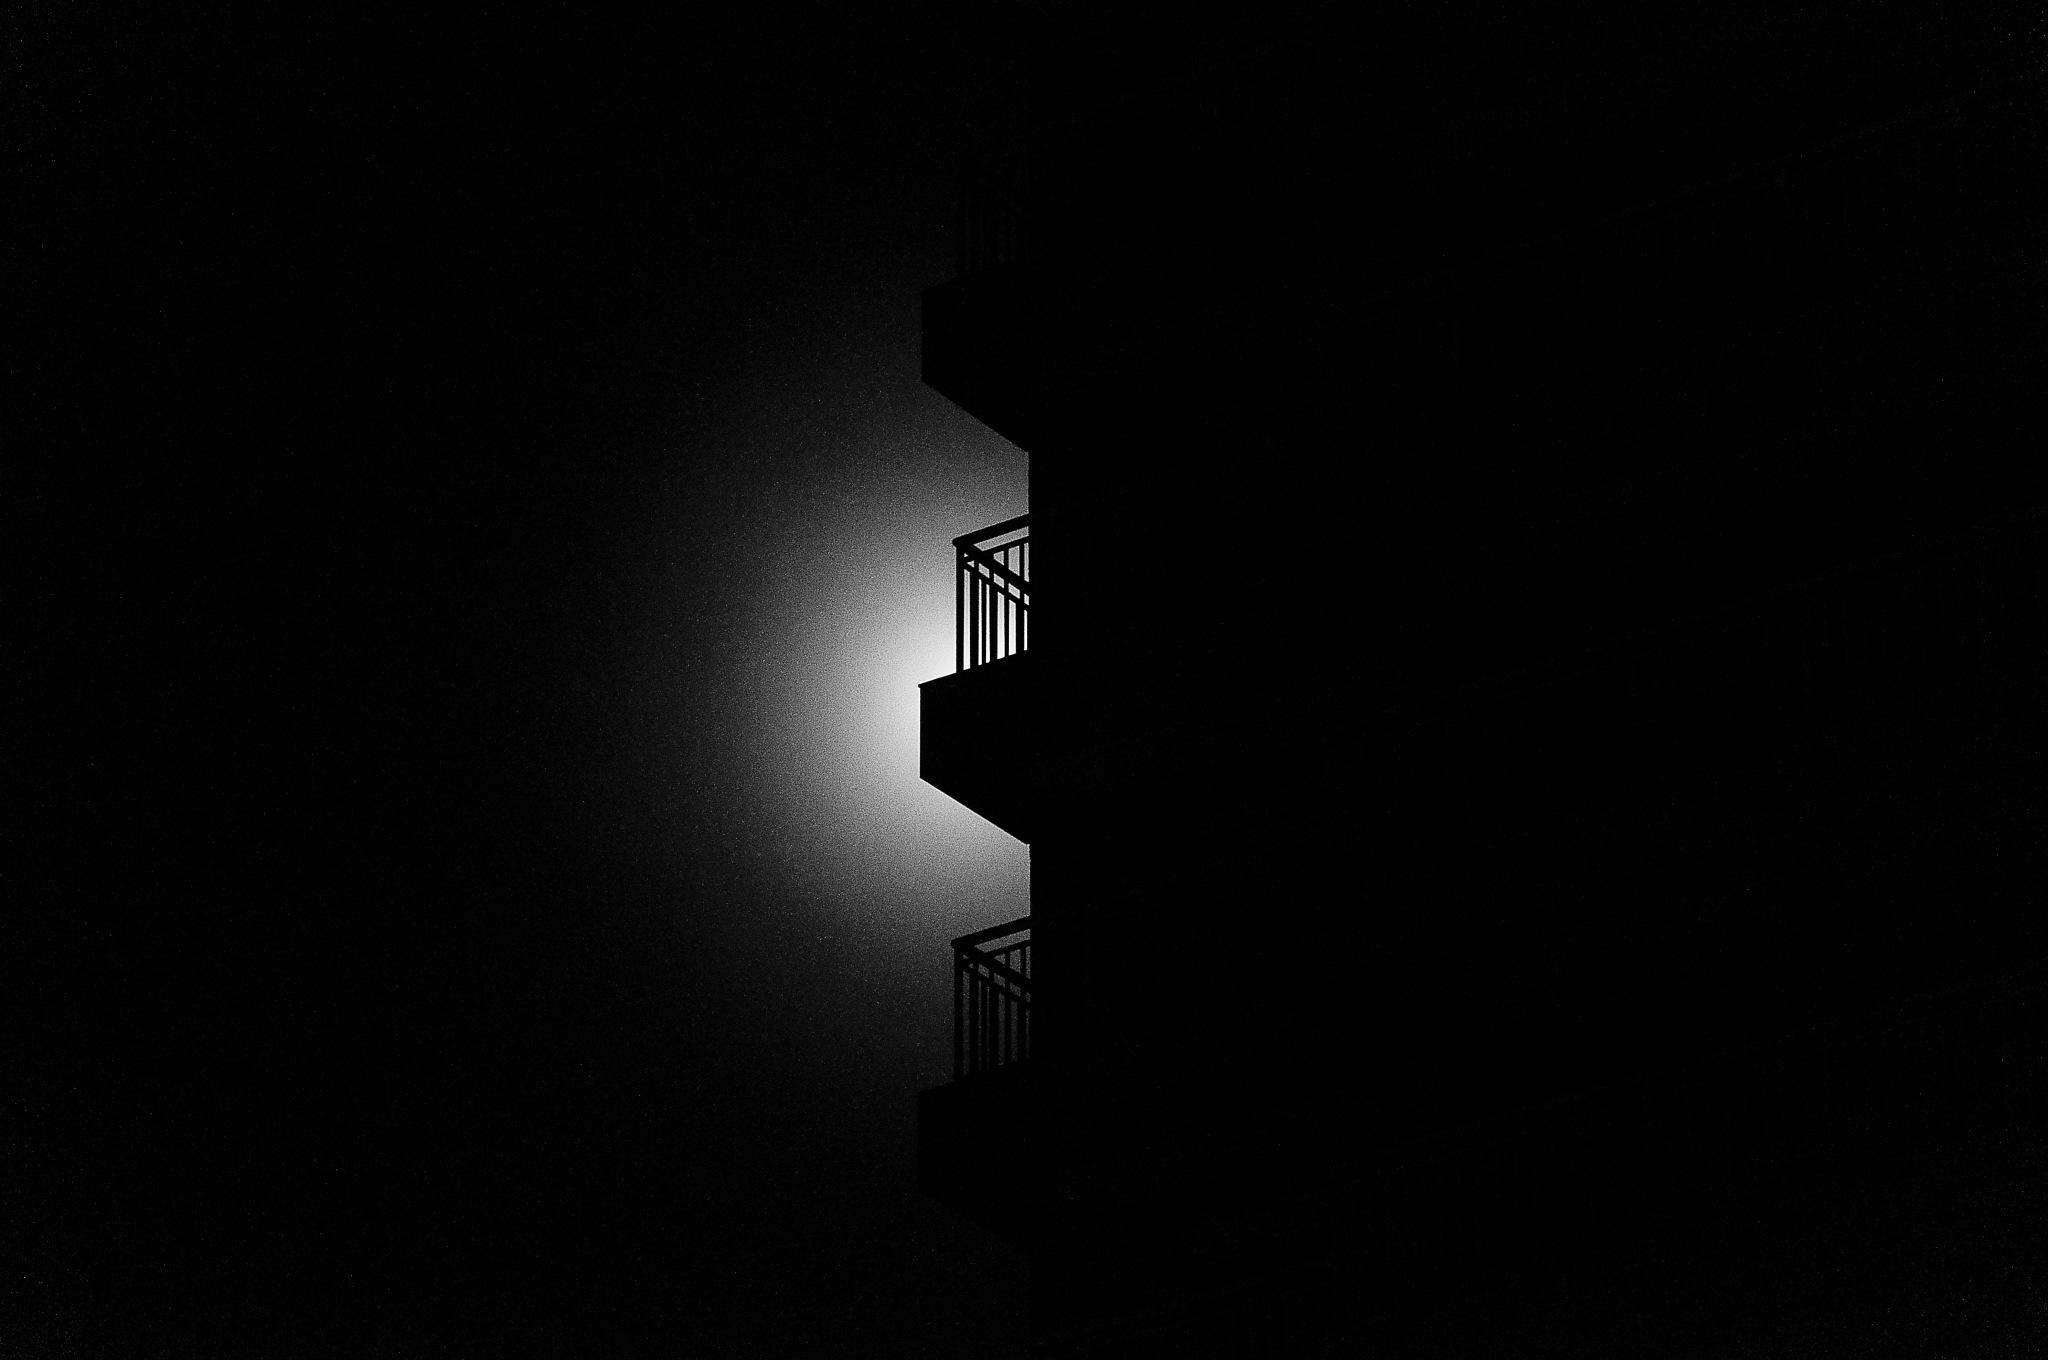 Sacada, Lua, Luz by Marcos Palhano